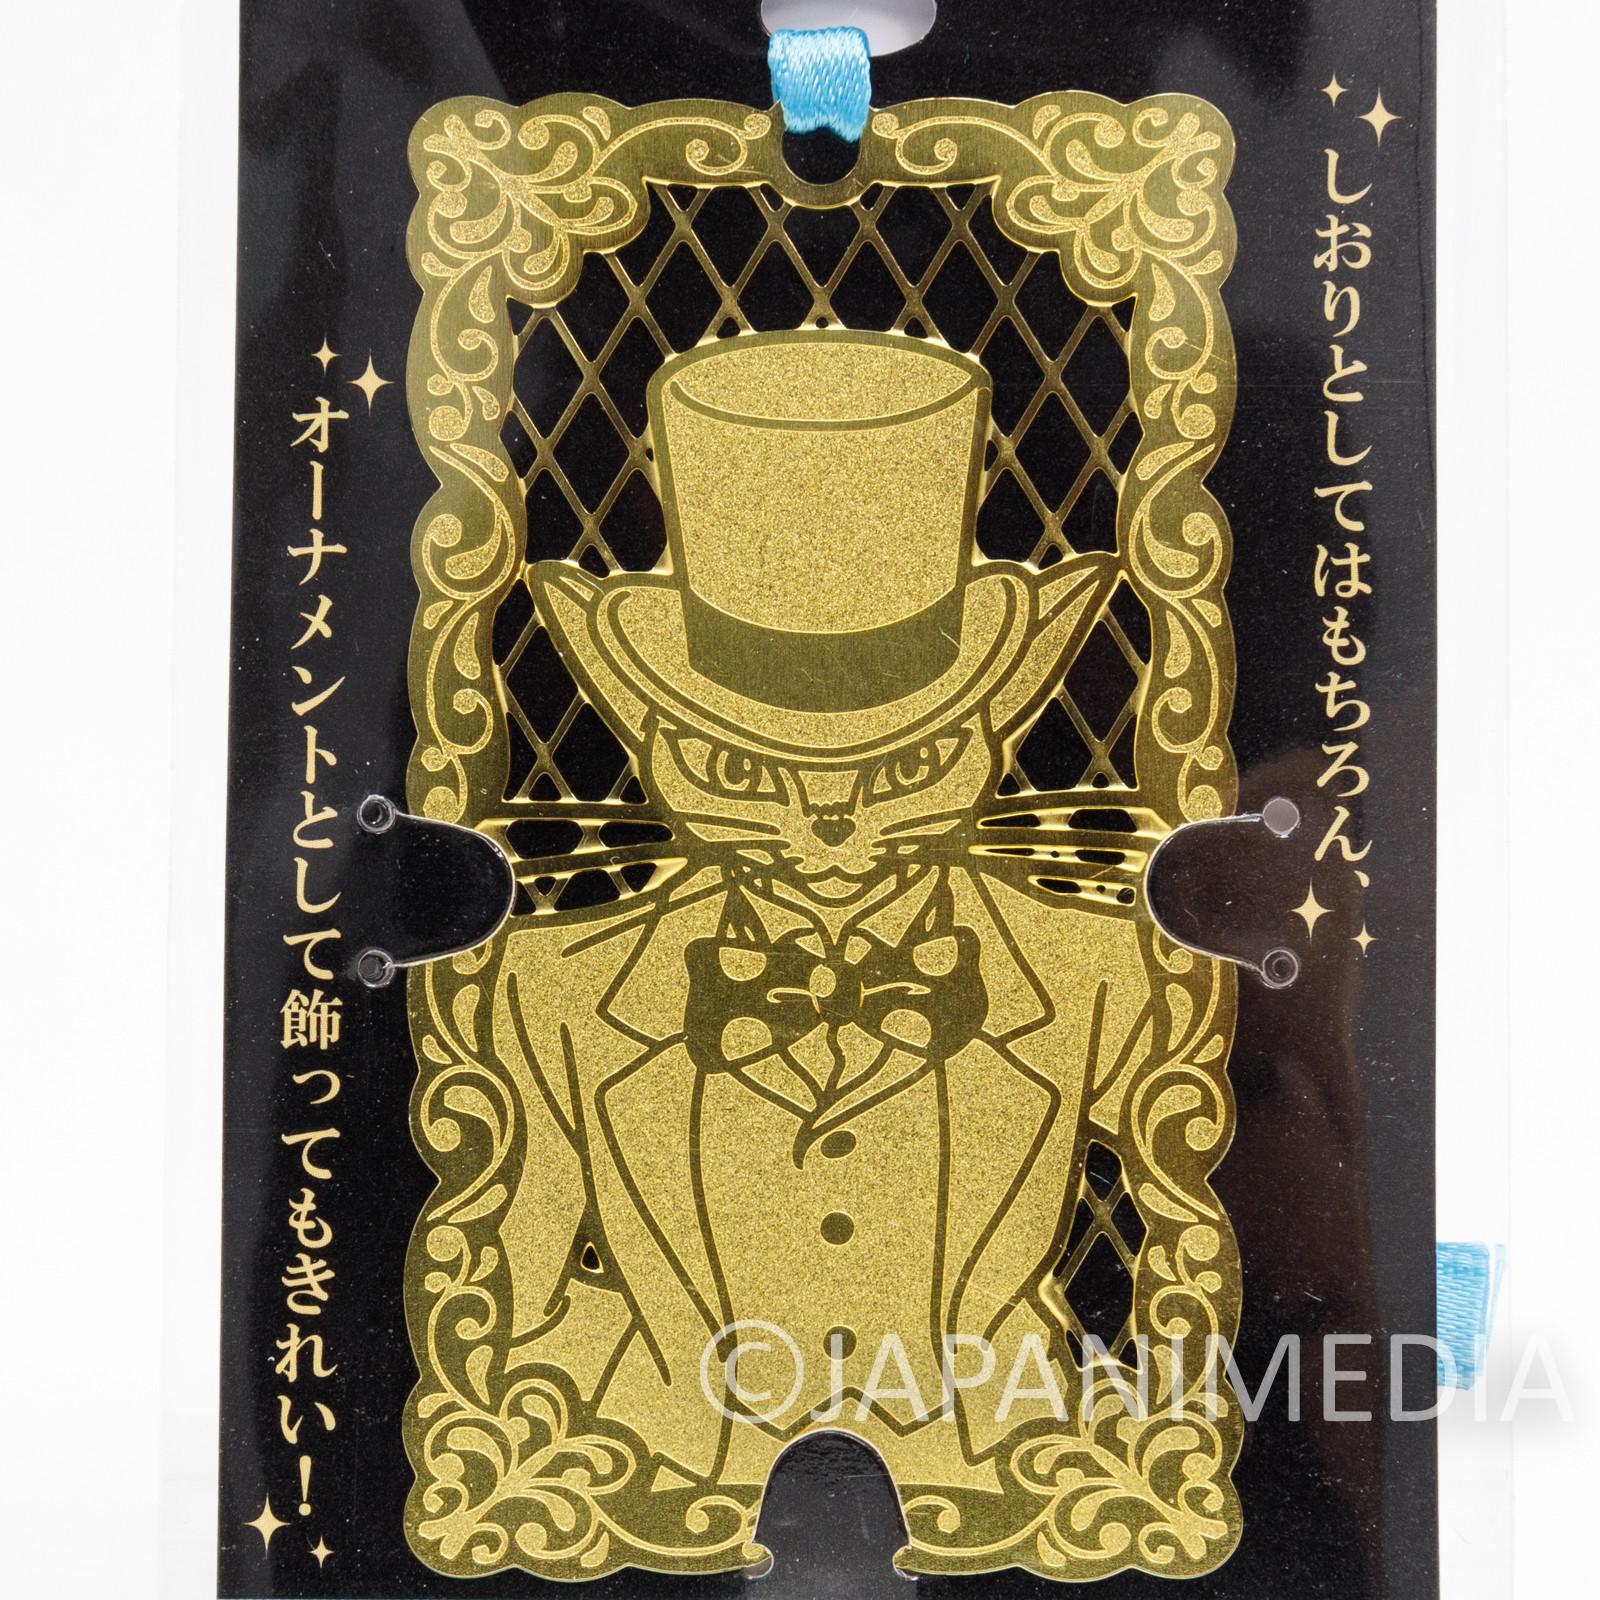 Whisper of the Heart Cat Baron Metal bookmark Ghibli JAPAN ANIME